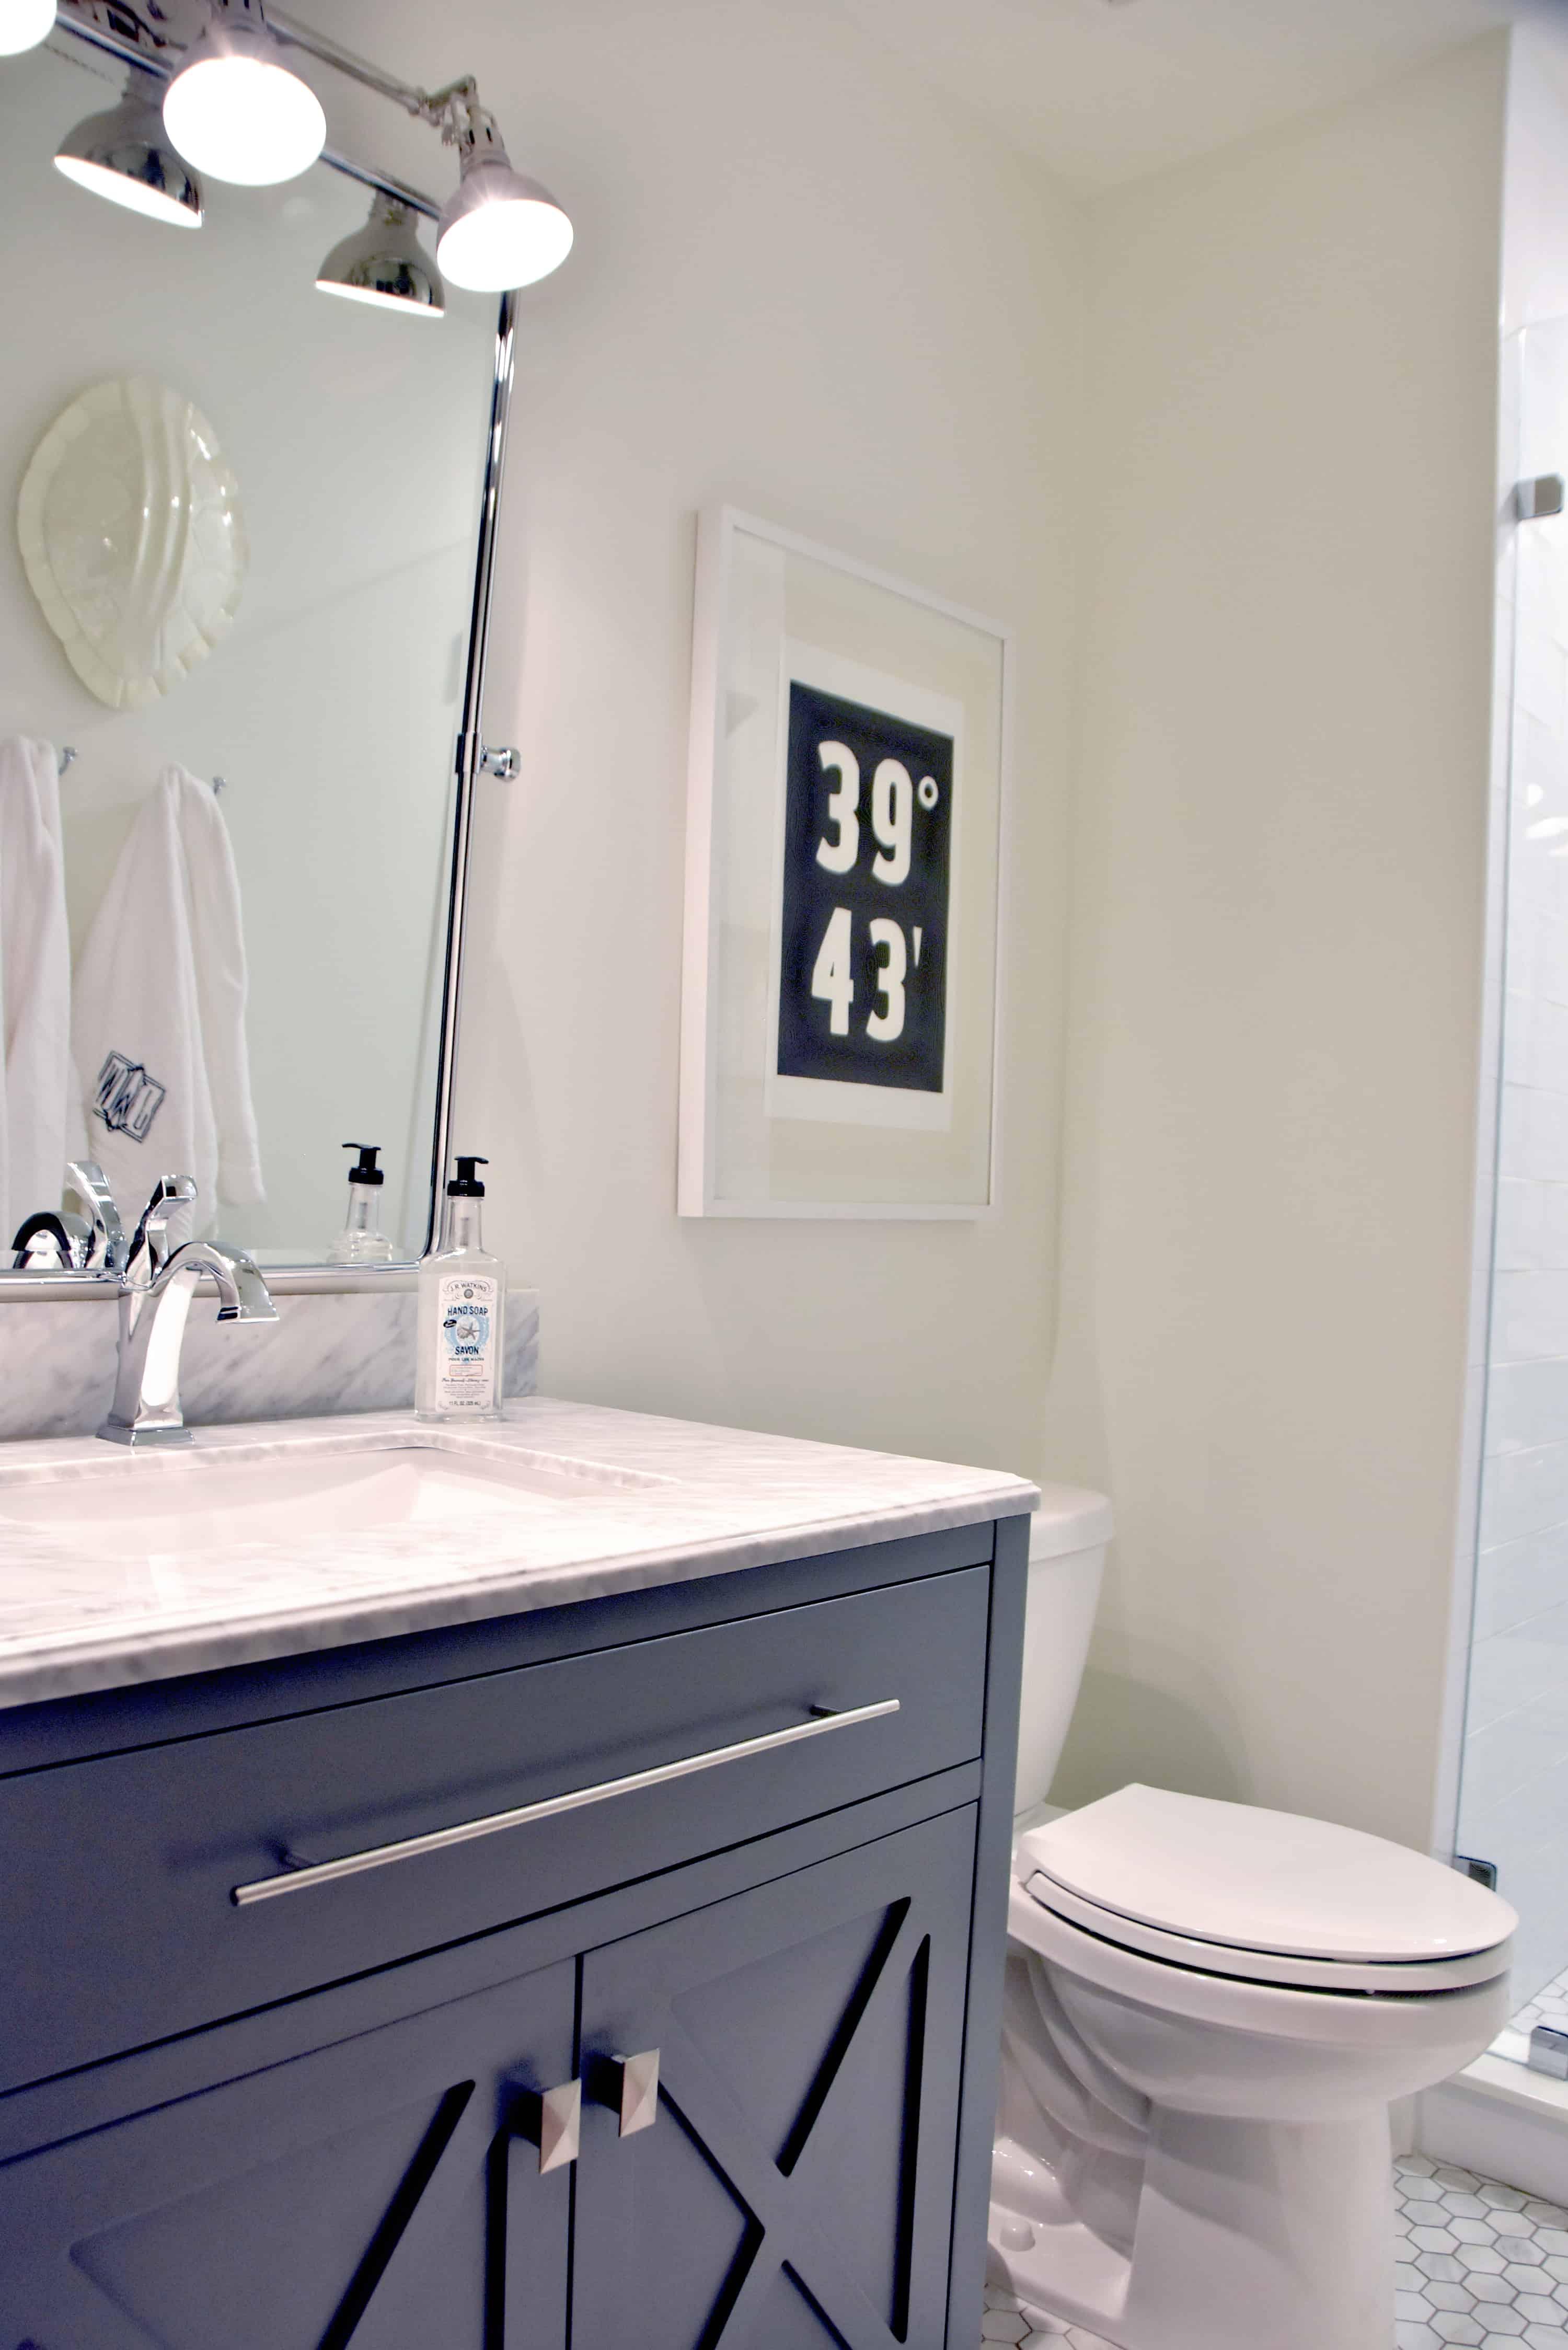 The Delightful Home Boys Bathroom Dixie Delights